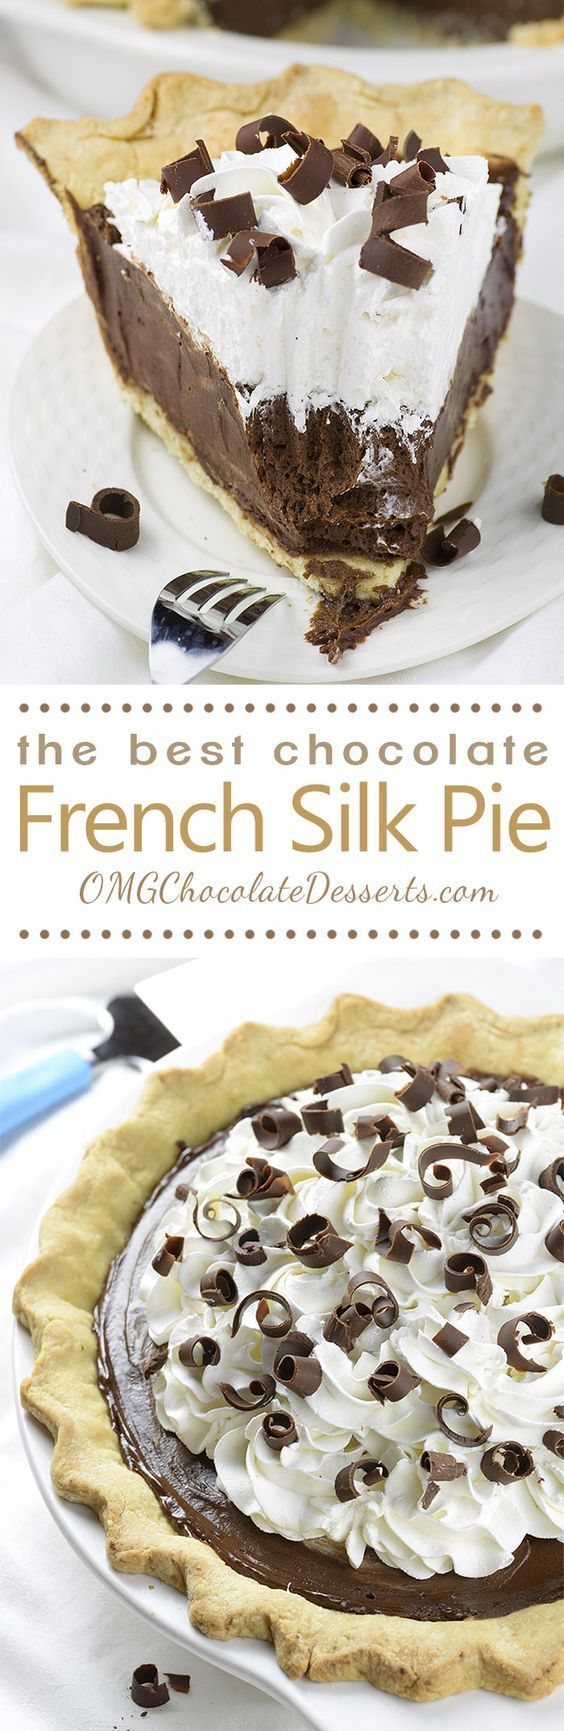 Chocolate French Silk Pie (not gluten-free)